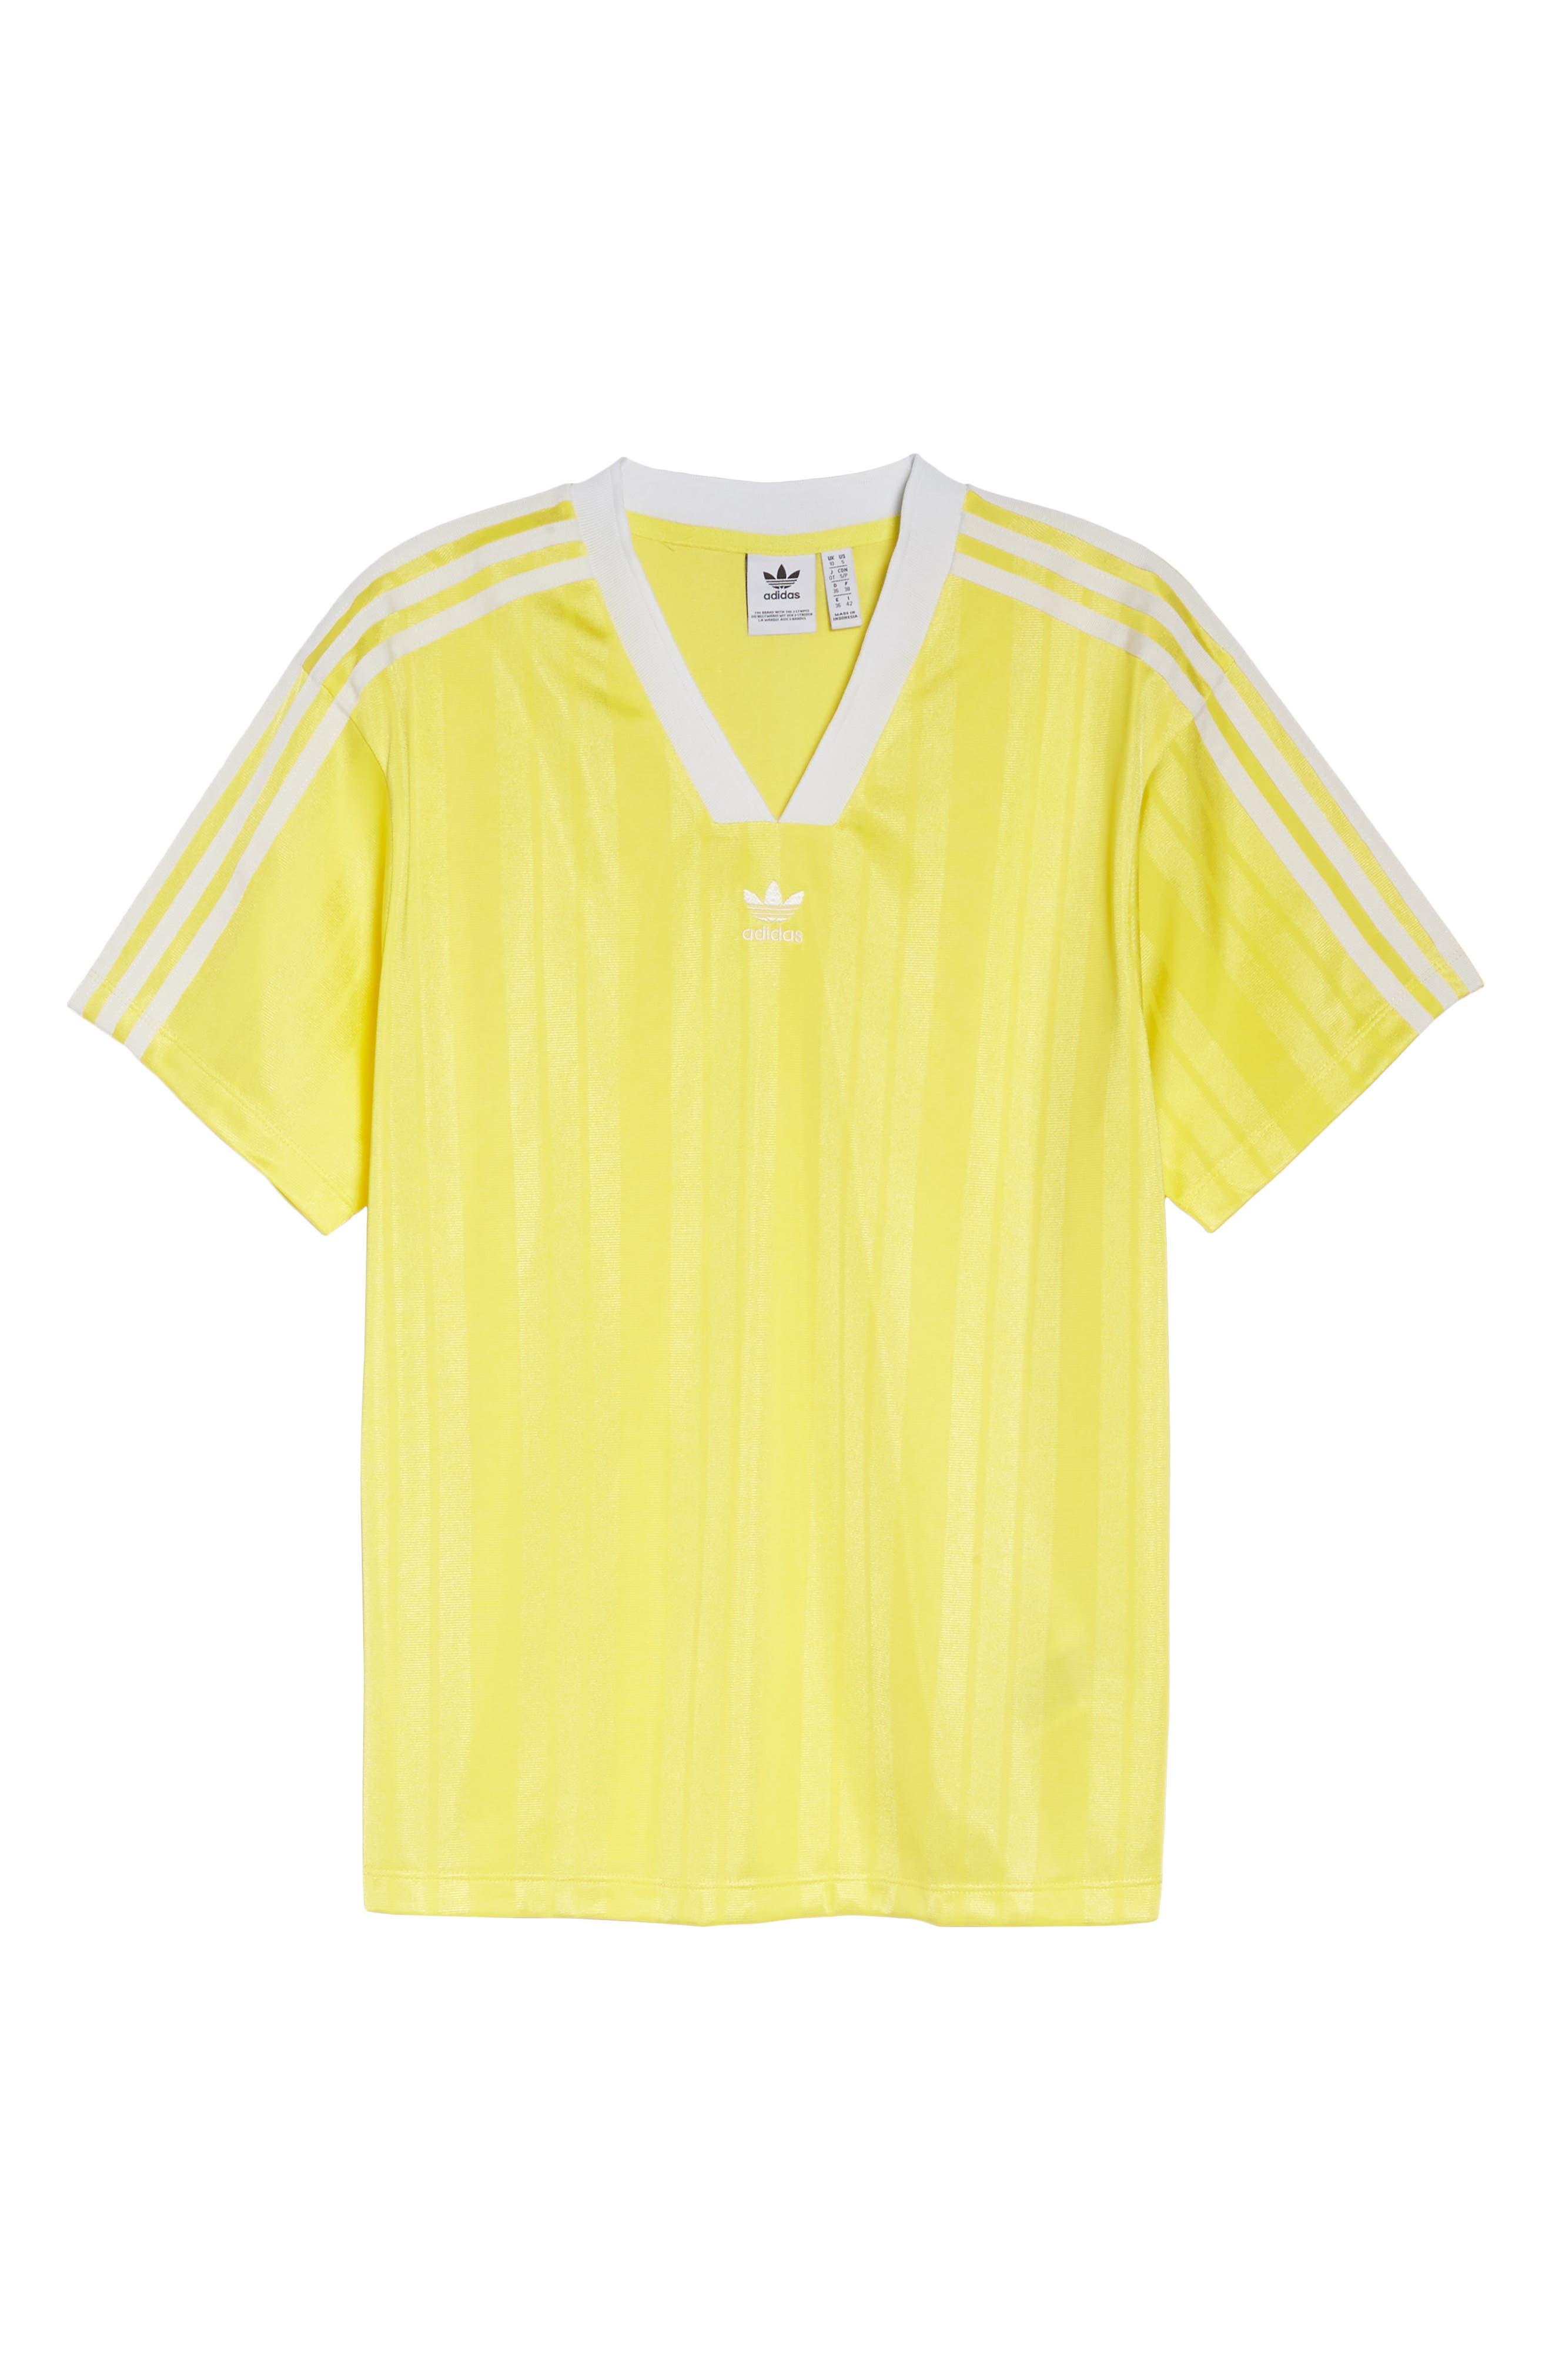 Originals Fashion League Jersey Tee,                             Alternate thumbnail 6, color,                             Prime Yellow